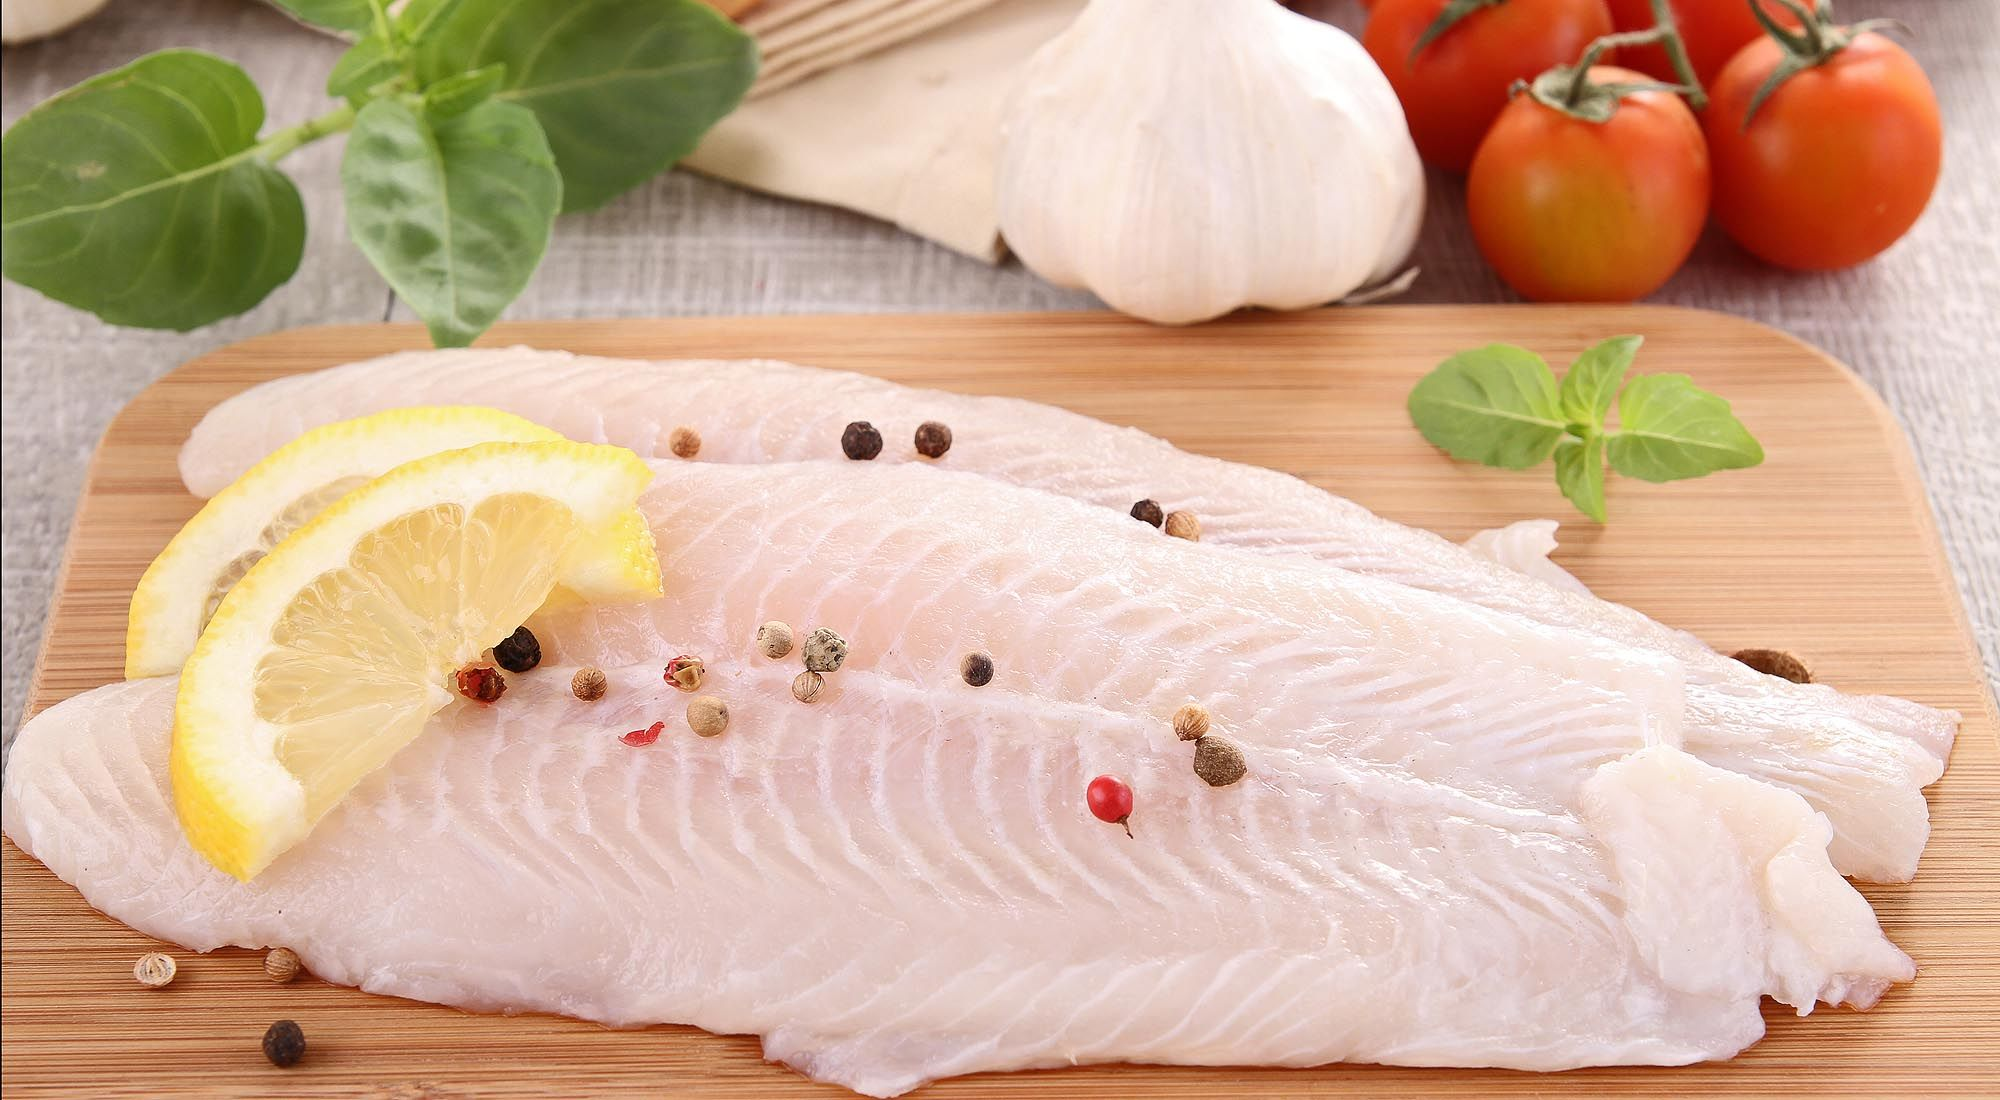 Filetes de pescado.